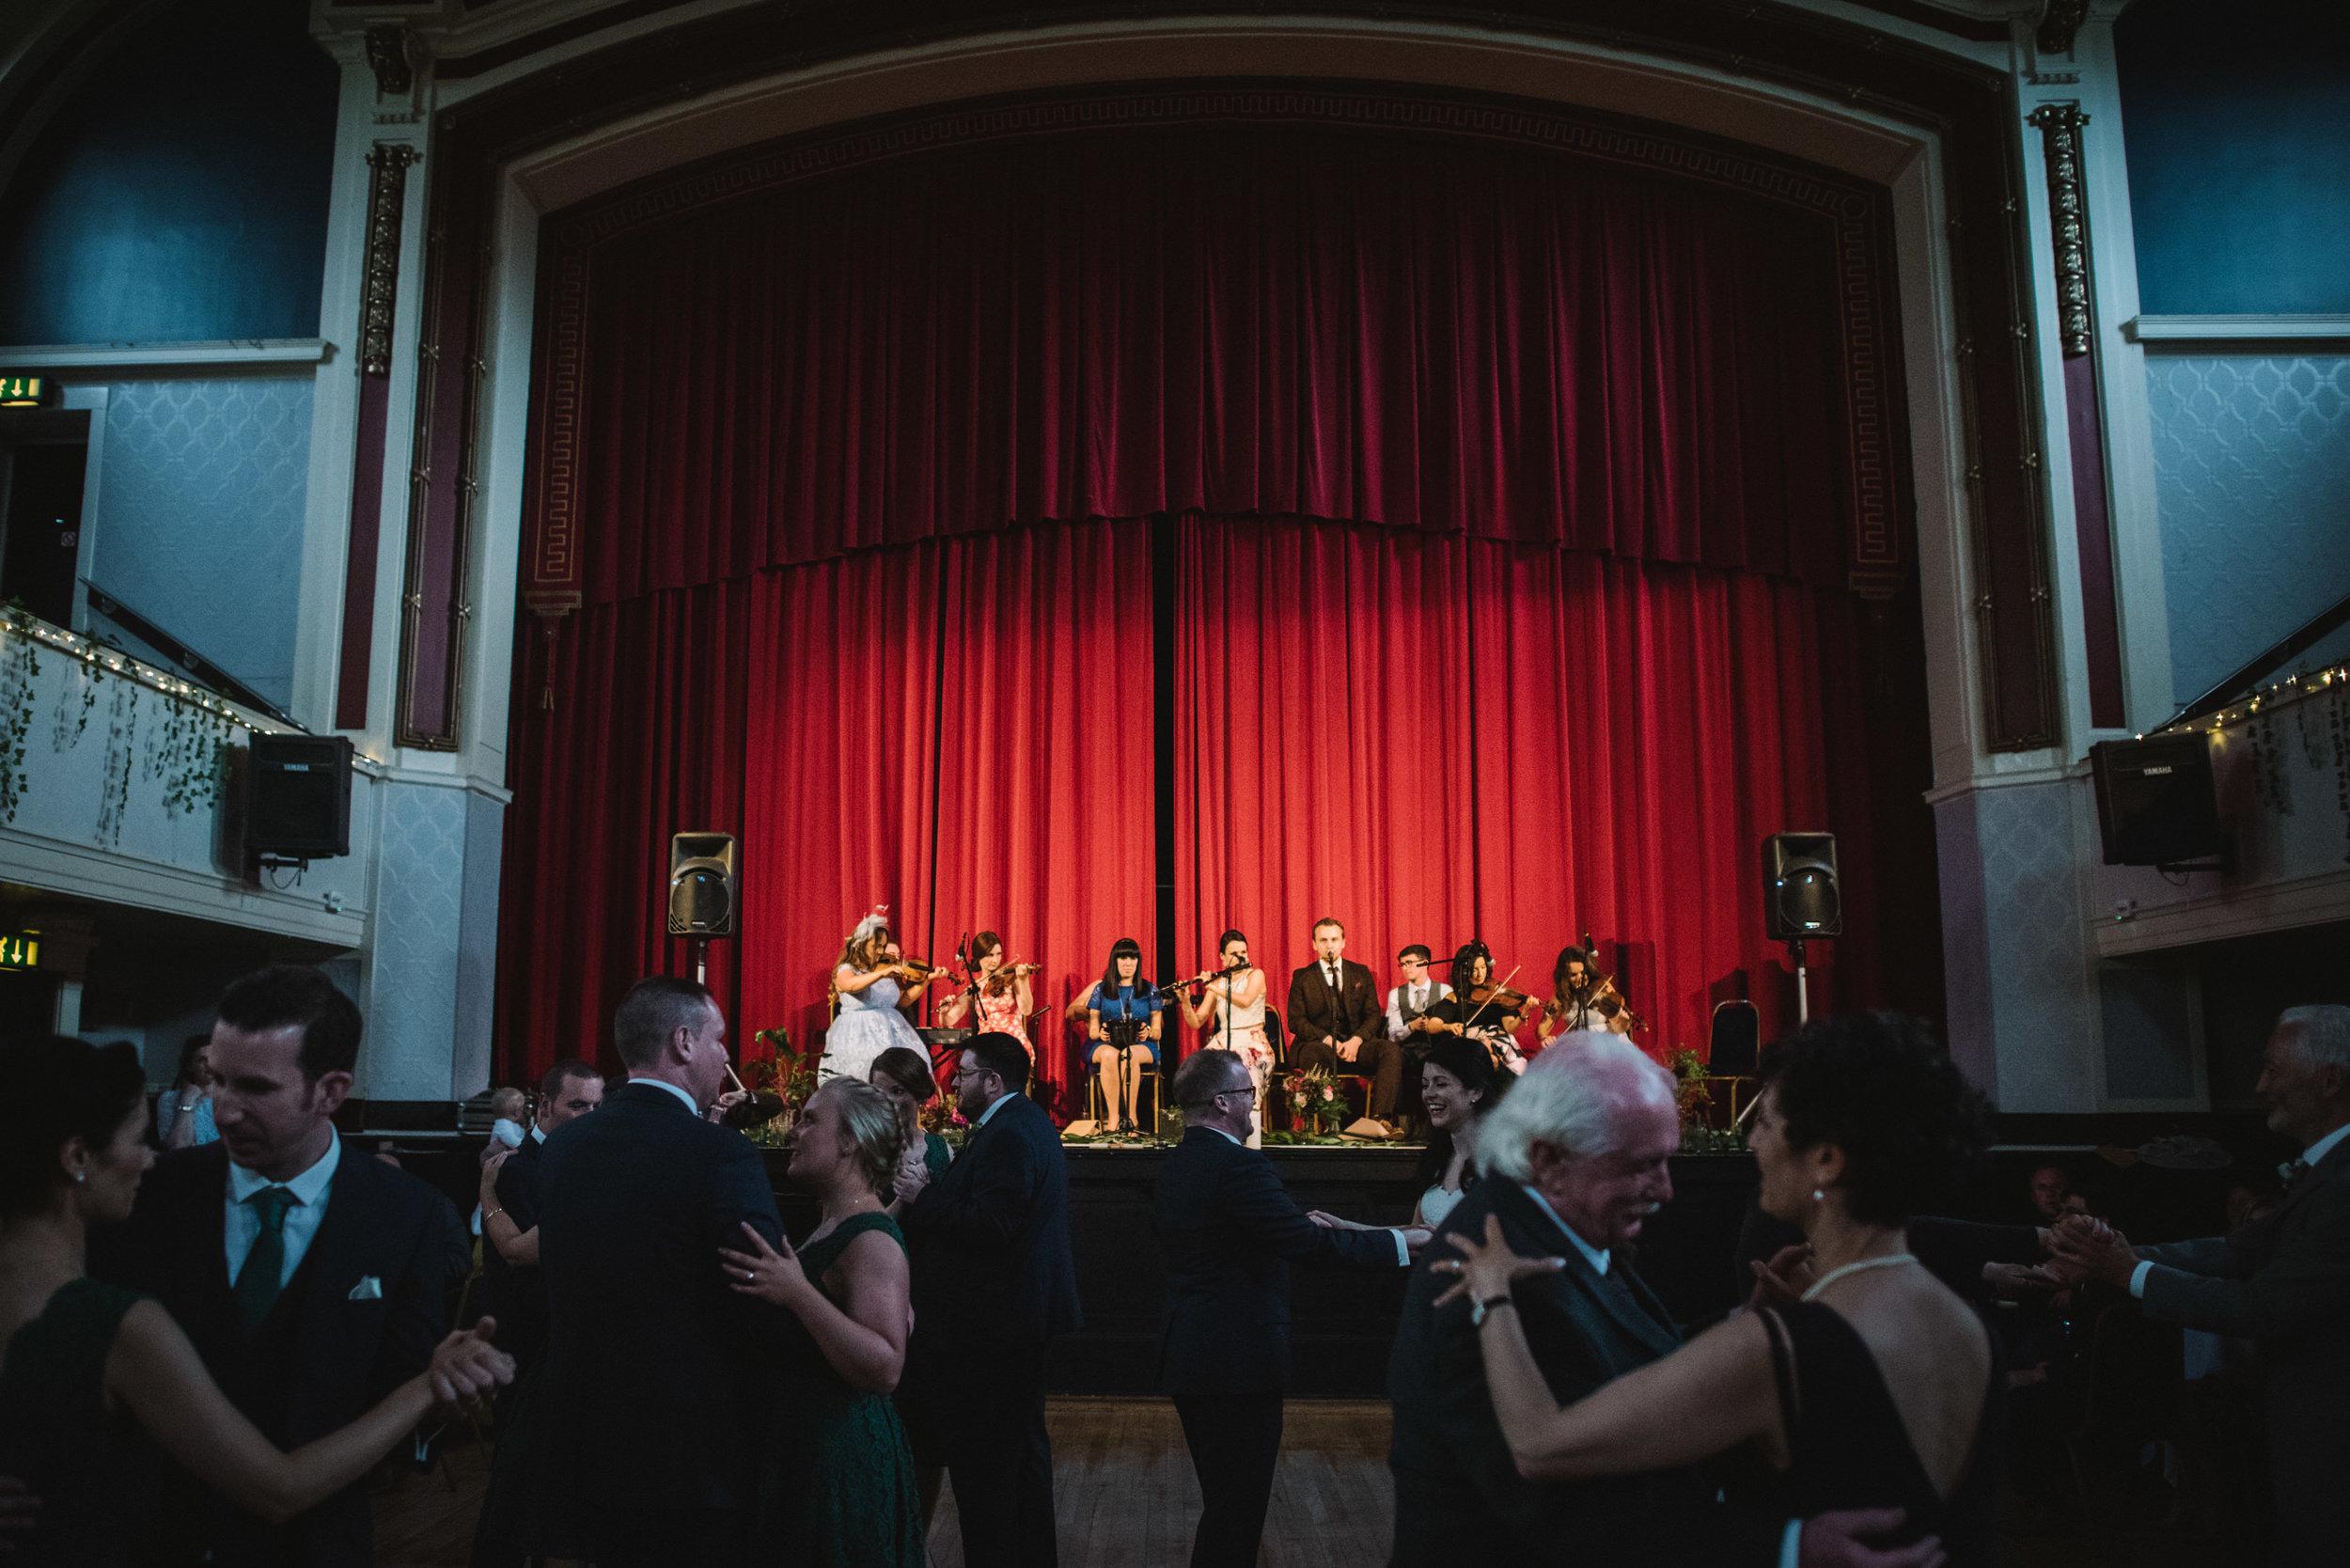 0180-LISA-DEVINE-PHOTOGRAPHY-ALTERNATIVE-WEDDING-PHOTOGRAPHY-SCOTLAND-DESTINATION-WEDDINGS-GLASGOW-WEDDINGS-COOL-WEDDINGS-STYLISH-WEDDINGS.JPG